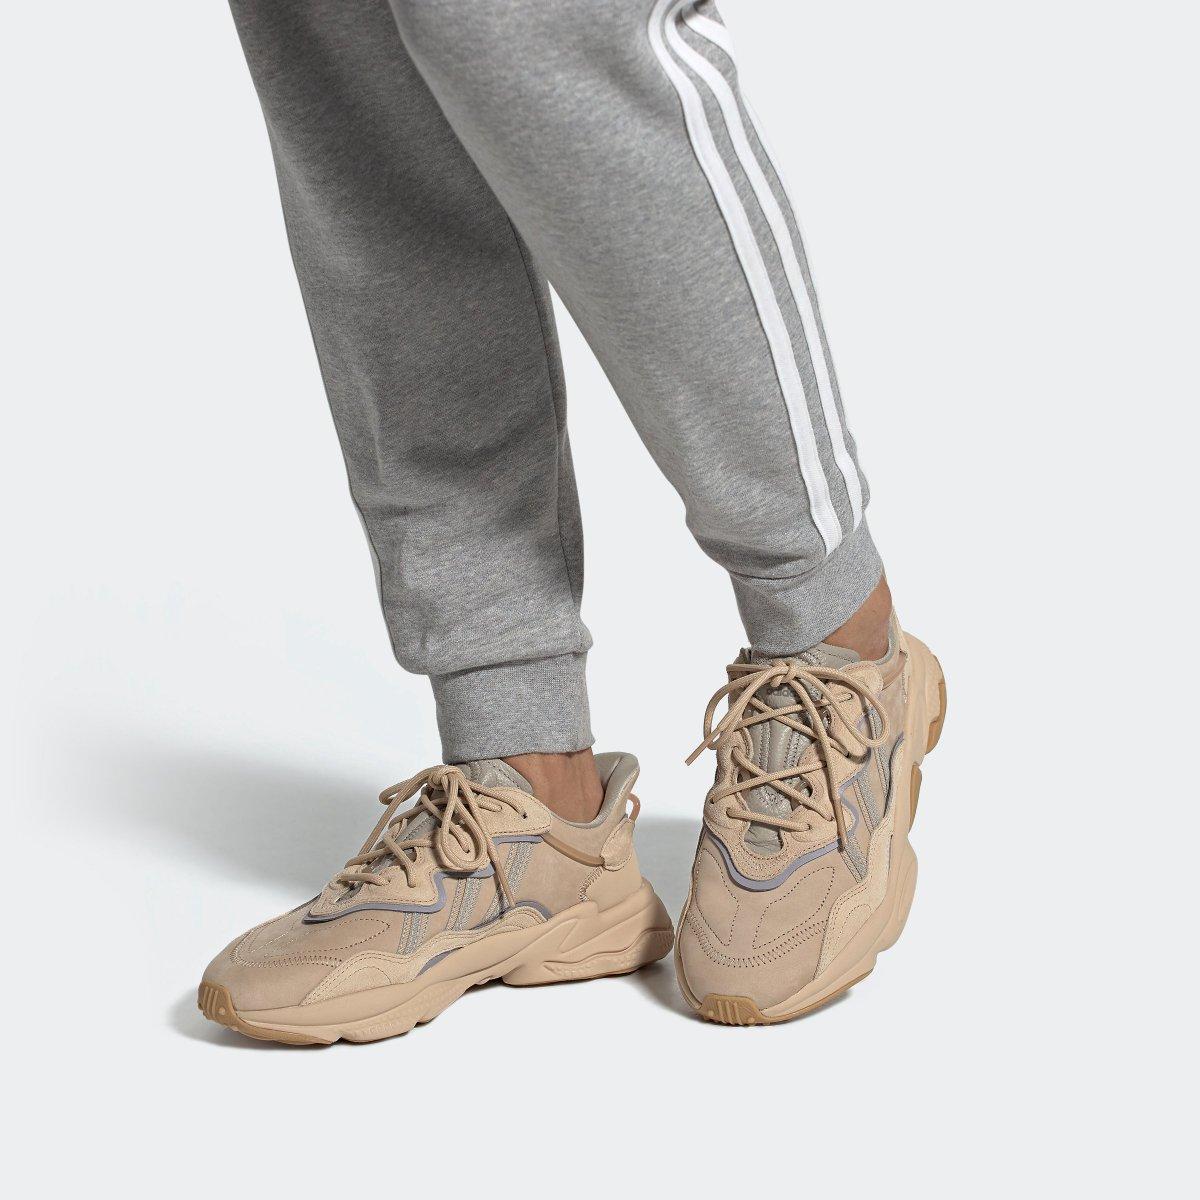 adidas originals ozweego khaki